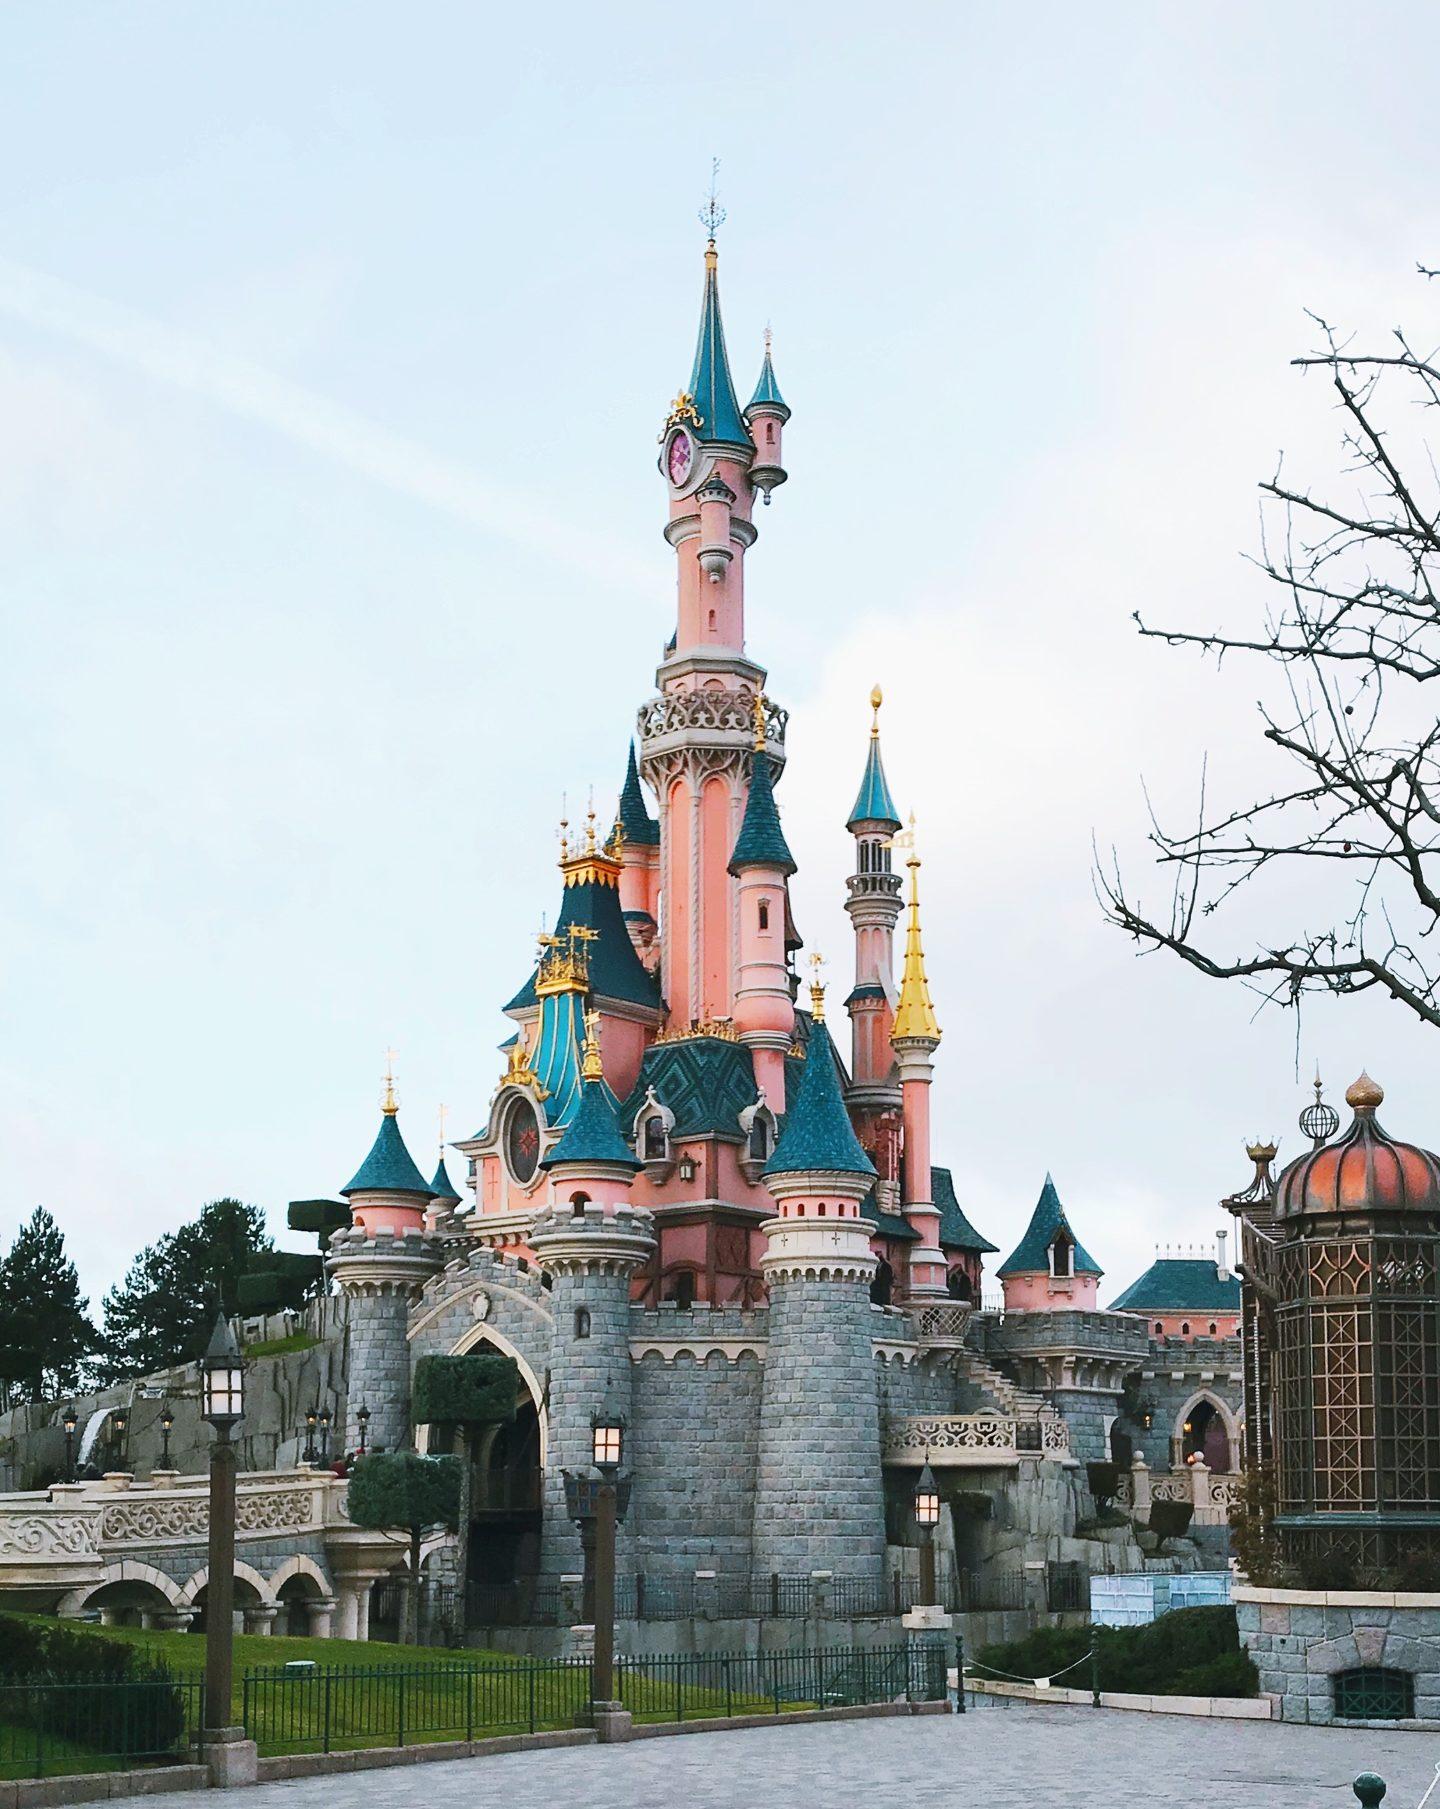 Sleeping Beauty's Castle and Disneyland Paris